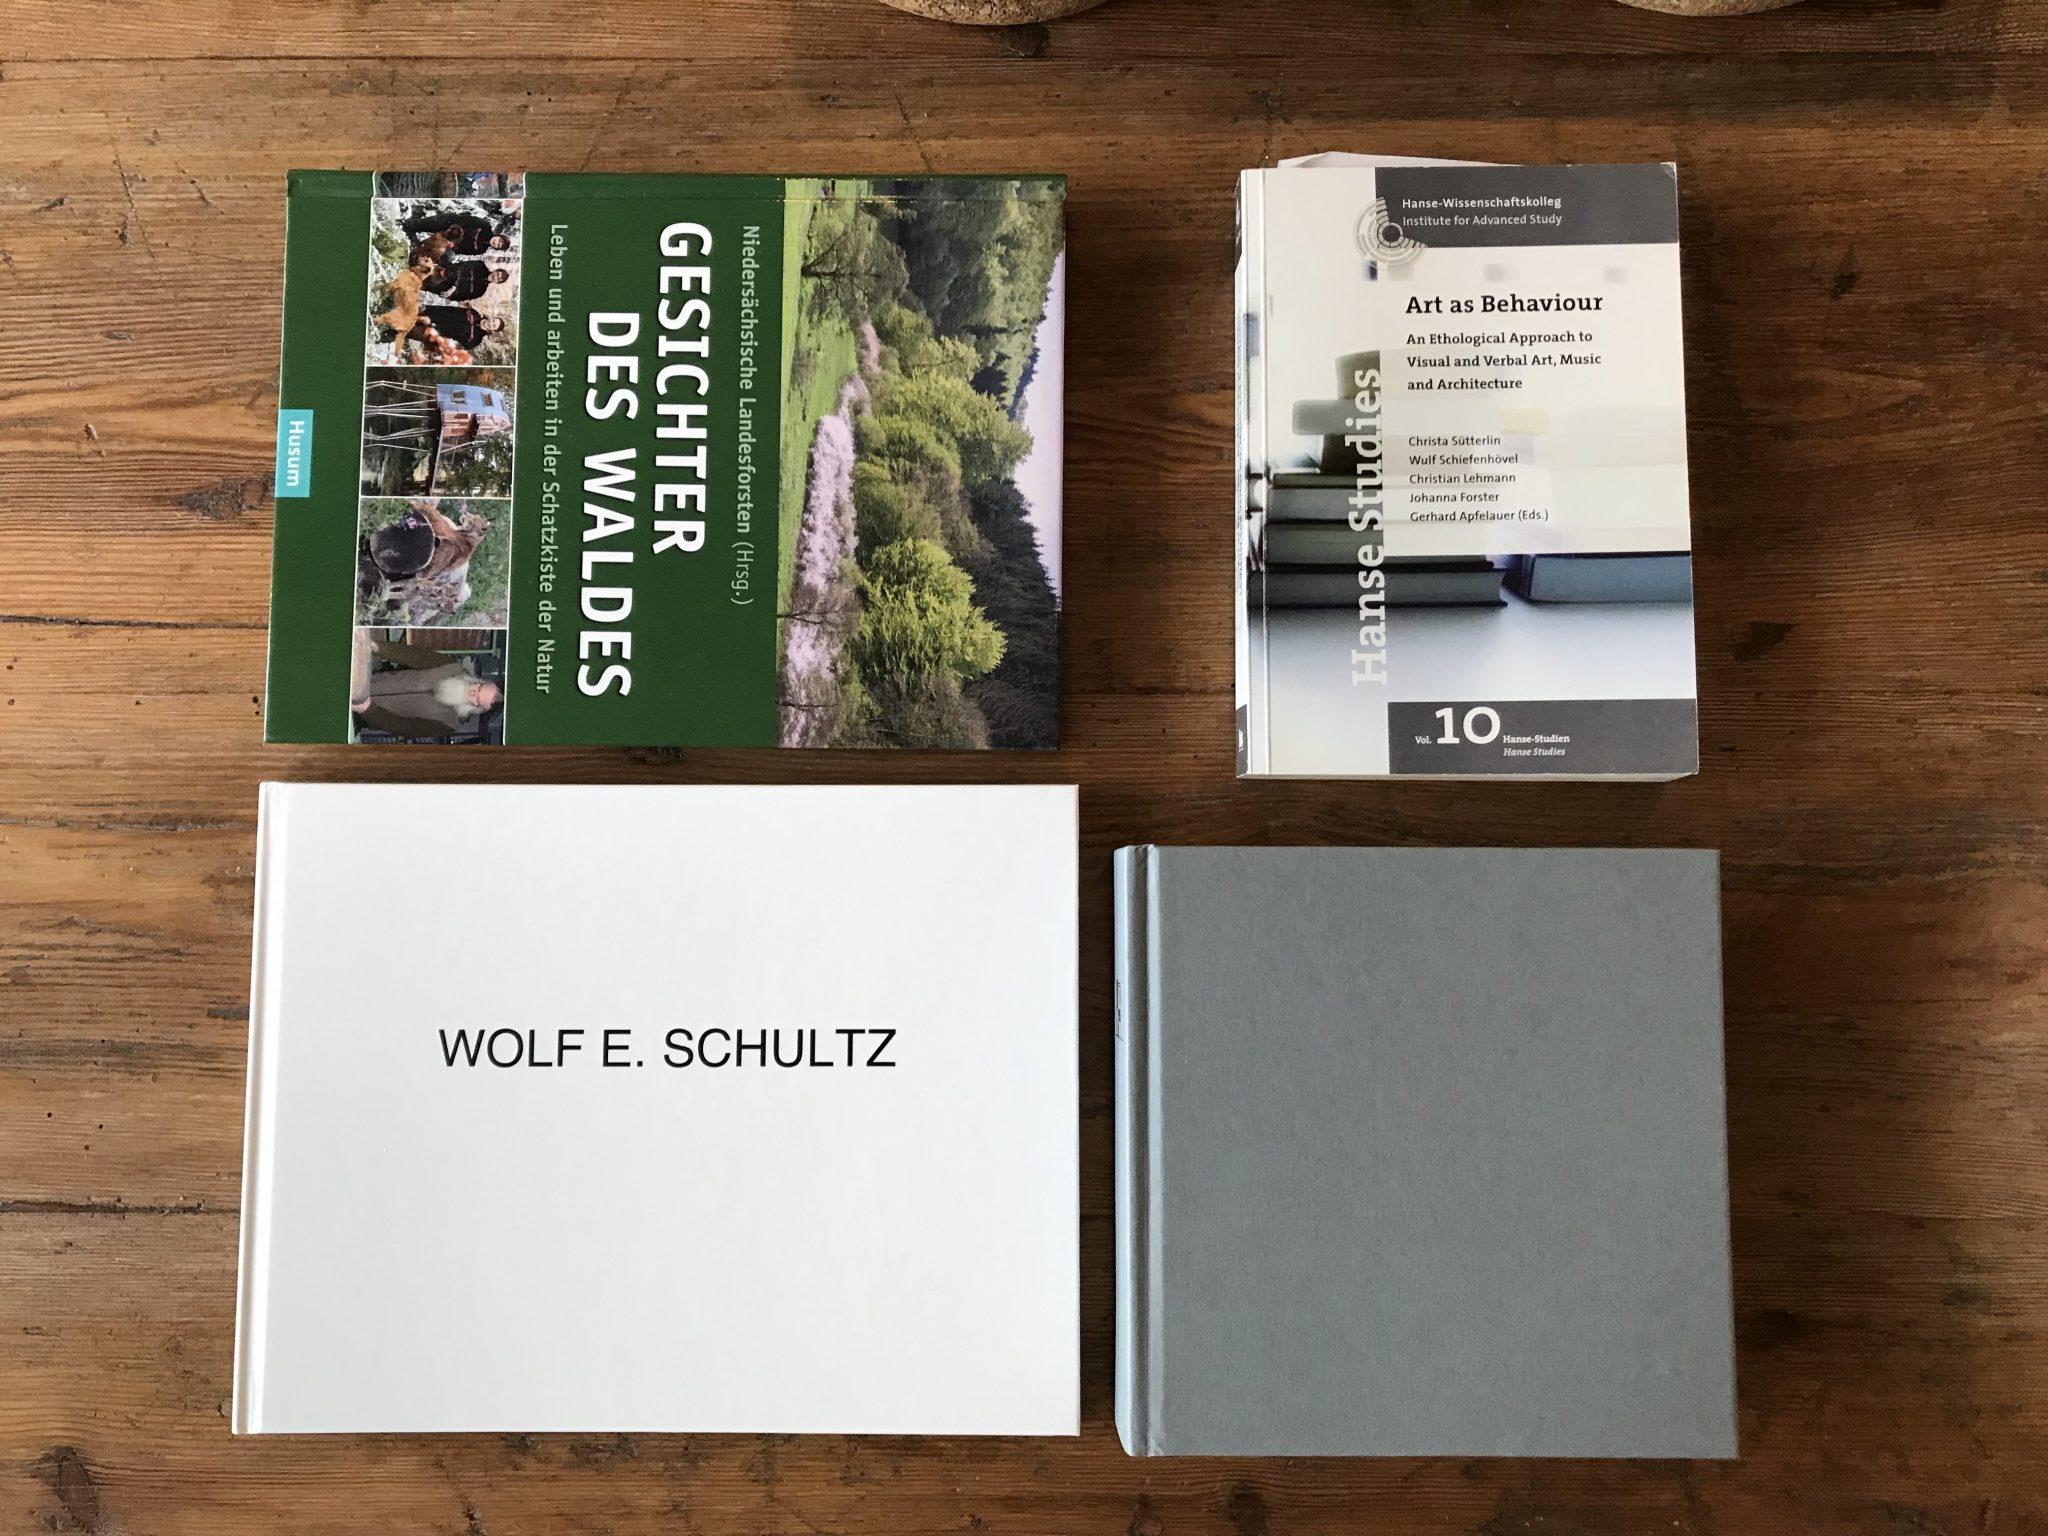 https://wolf-e-schultz.de/wp-content/uploads/2019/09/Publikationen_Wolf_E_Schultz.jpg